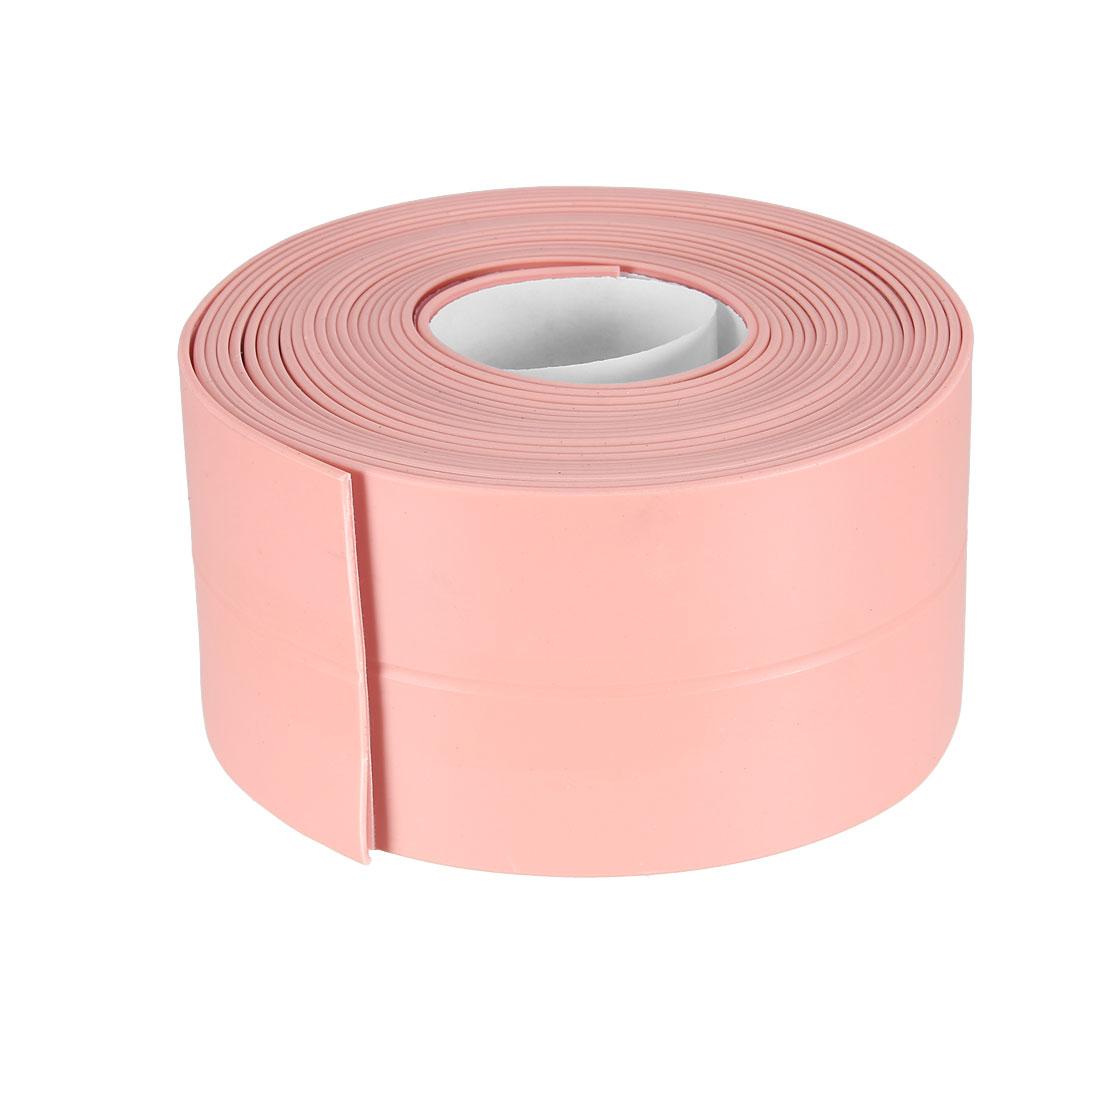 Caulk Strip Flexible Self Adhesive Tape for Wall Sealing 10.5ftx38mm (Pink)